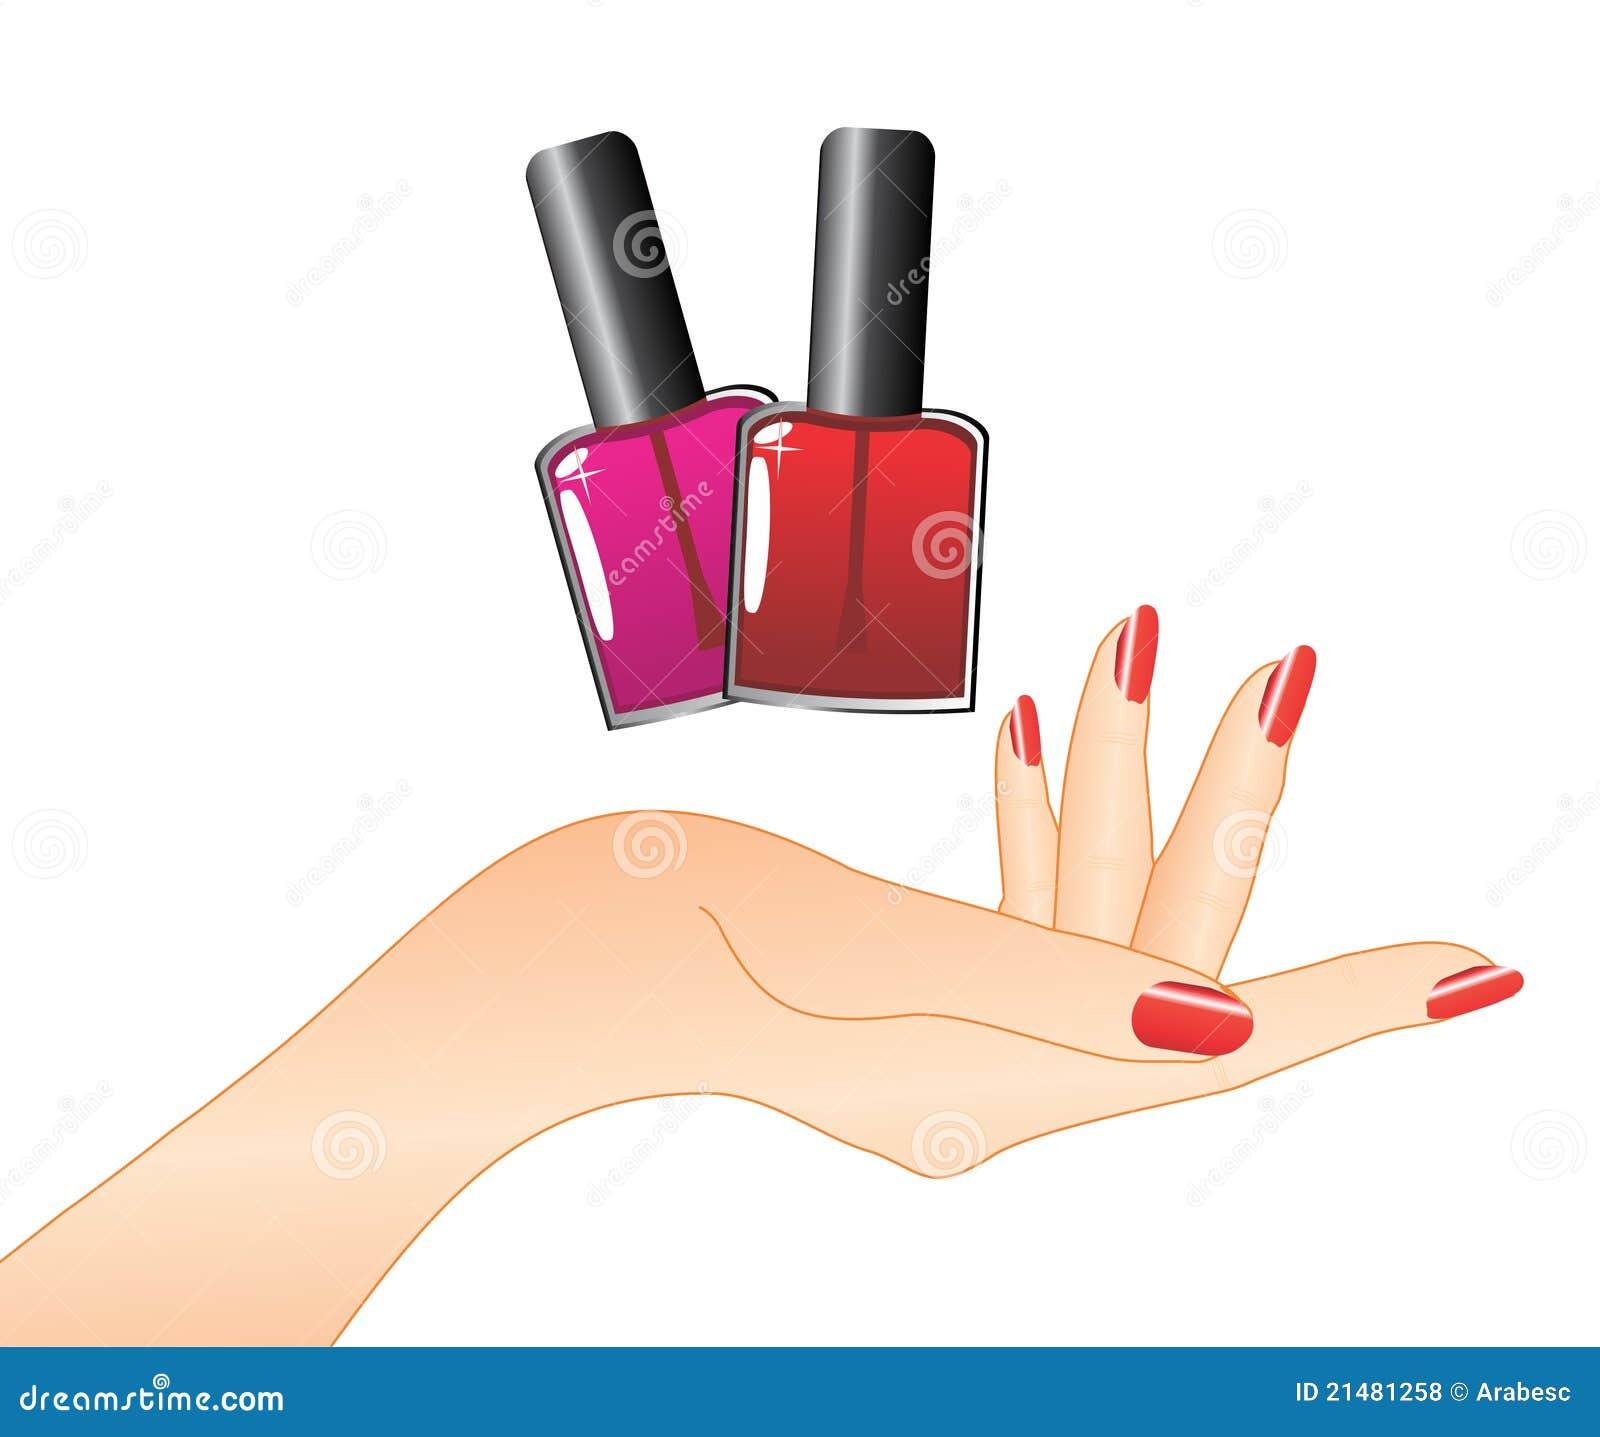 top logo design nail salon logo design hand with red nail polish royalty free stock - Nail Salon Logo Design Ideas